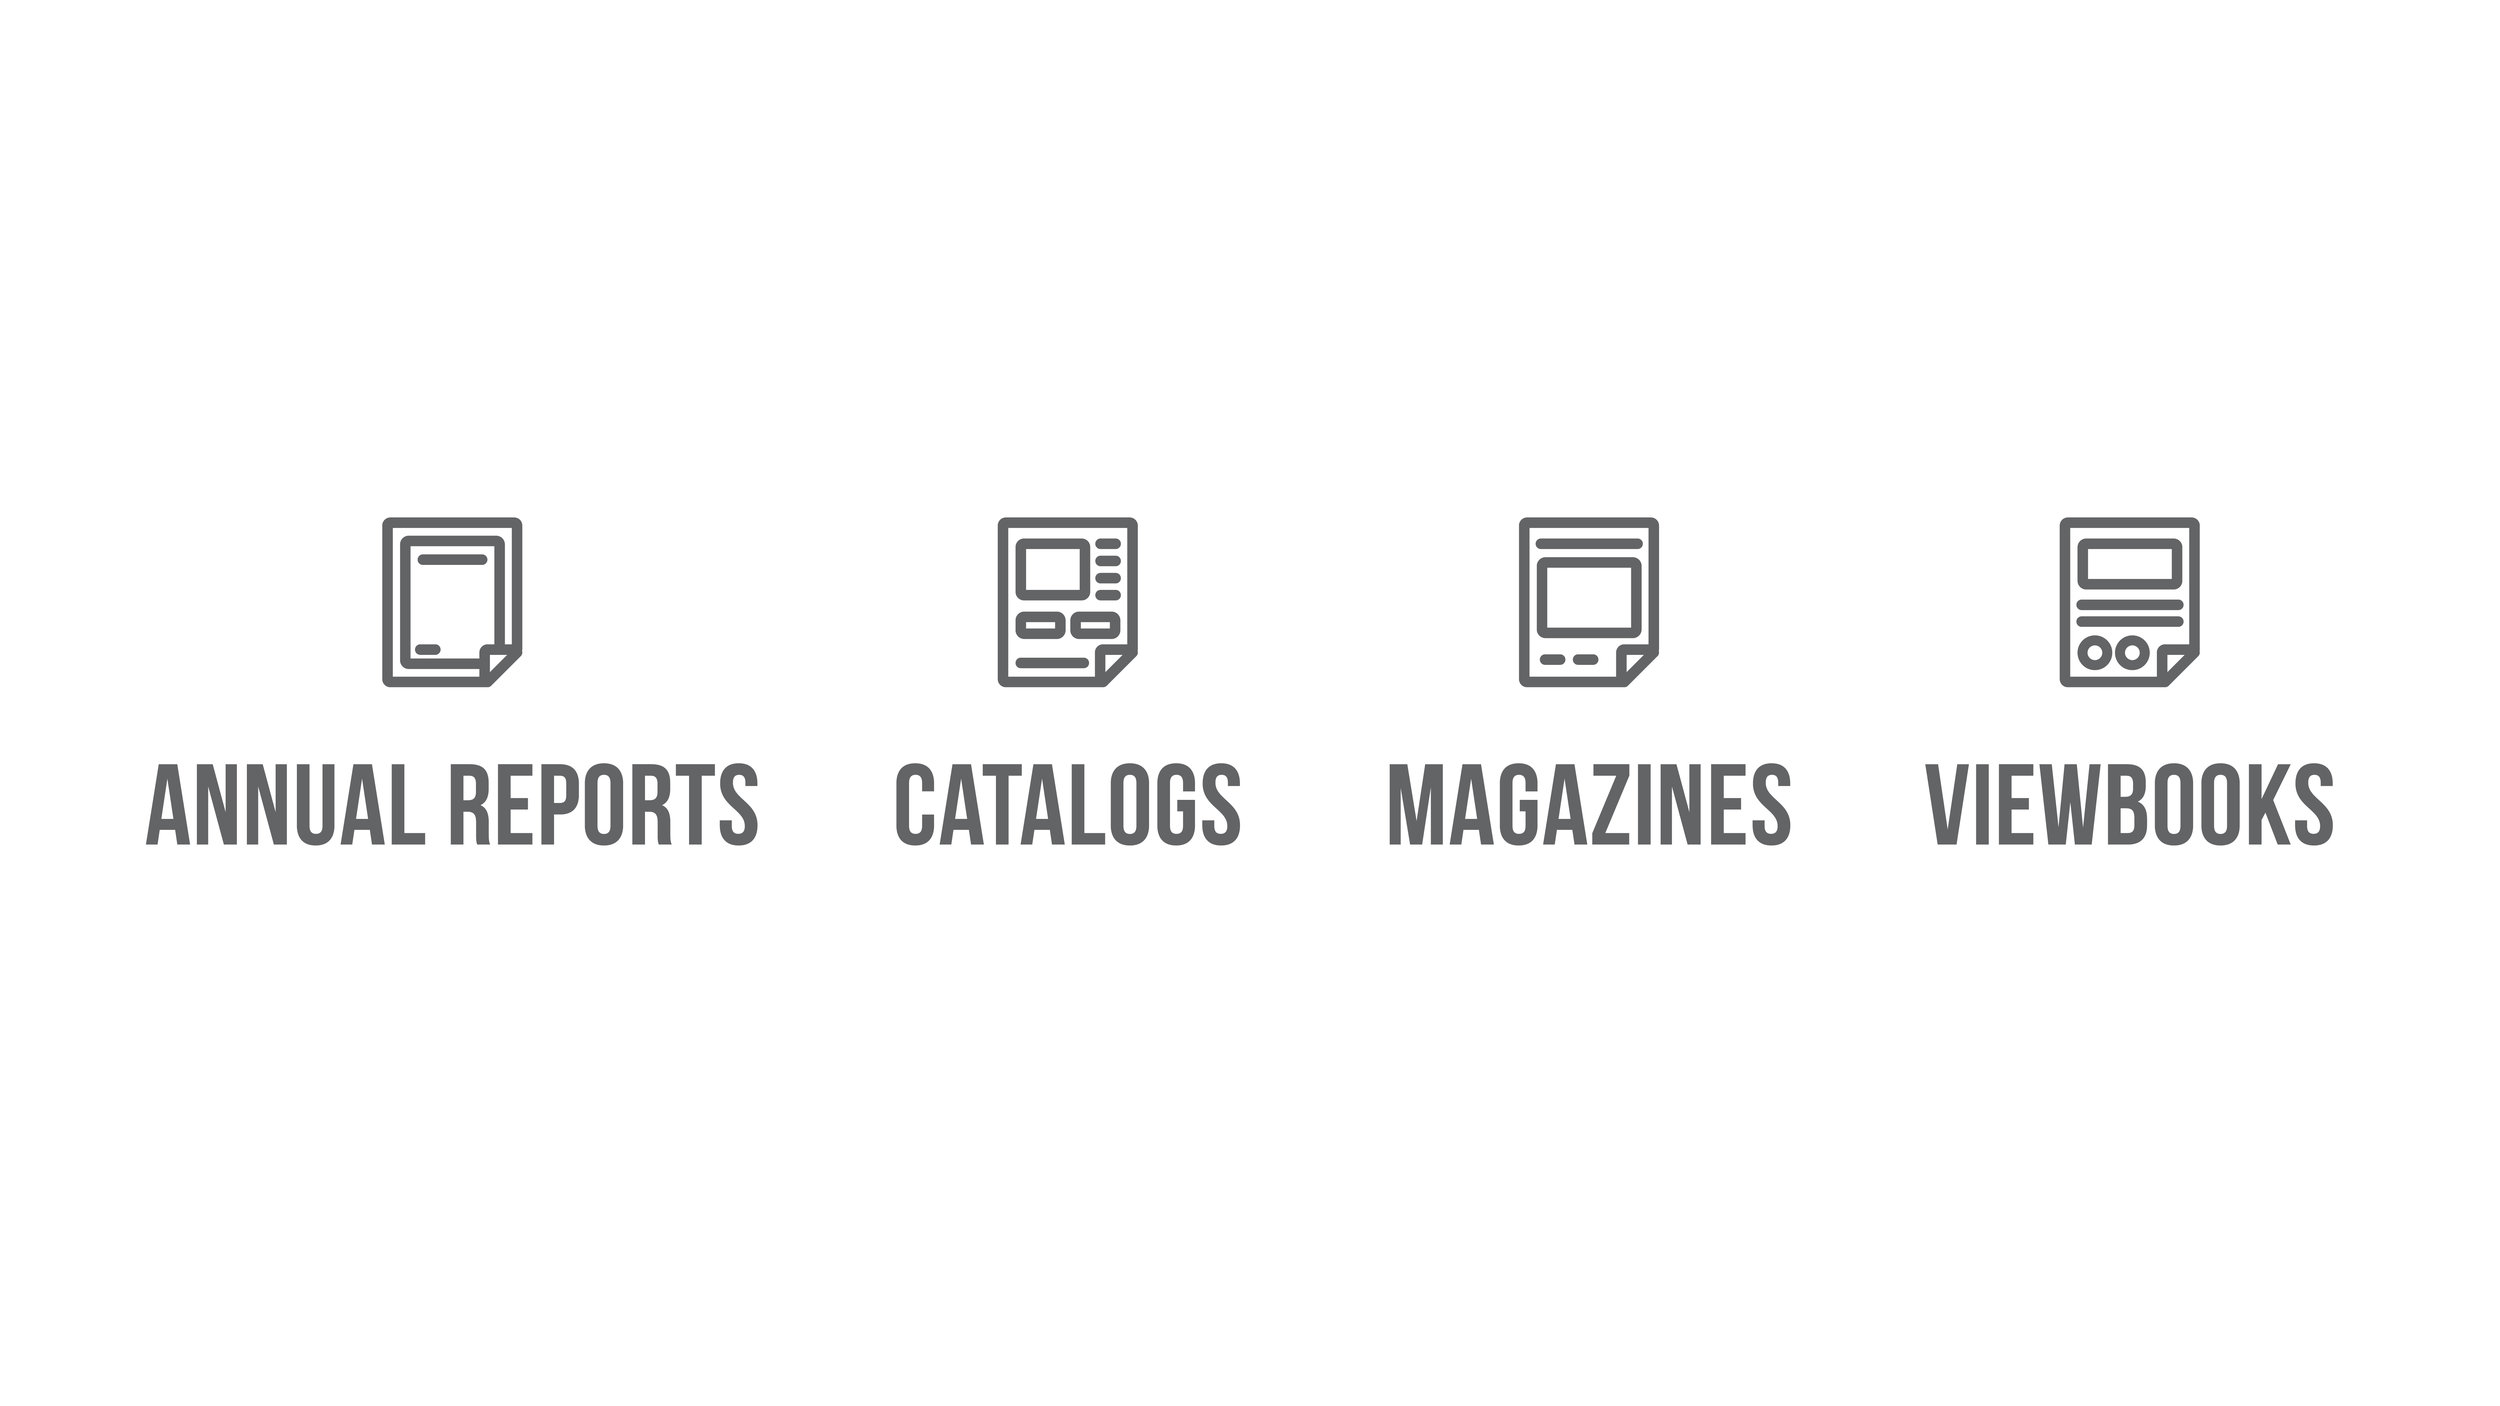 Website Image categories.jpg